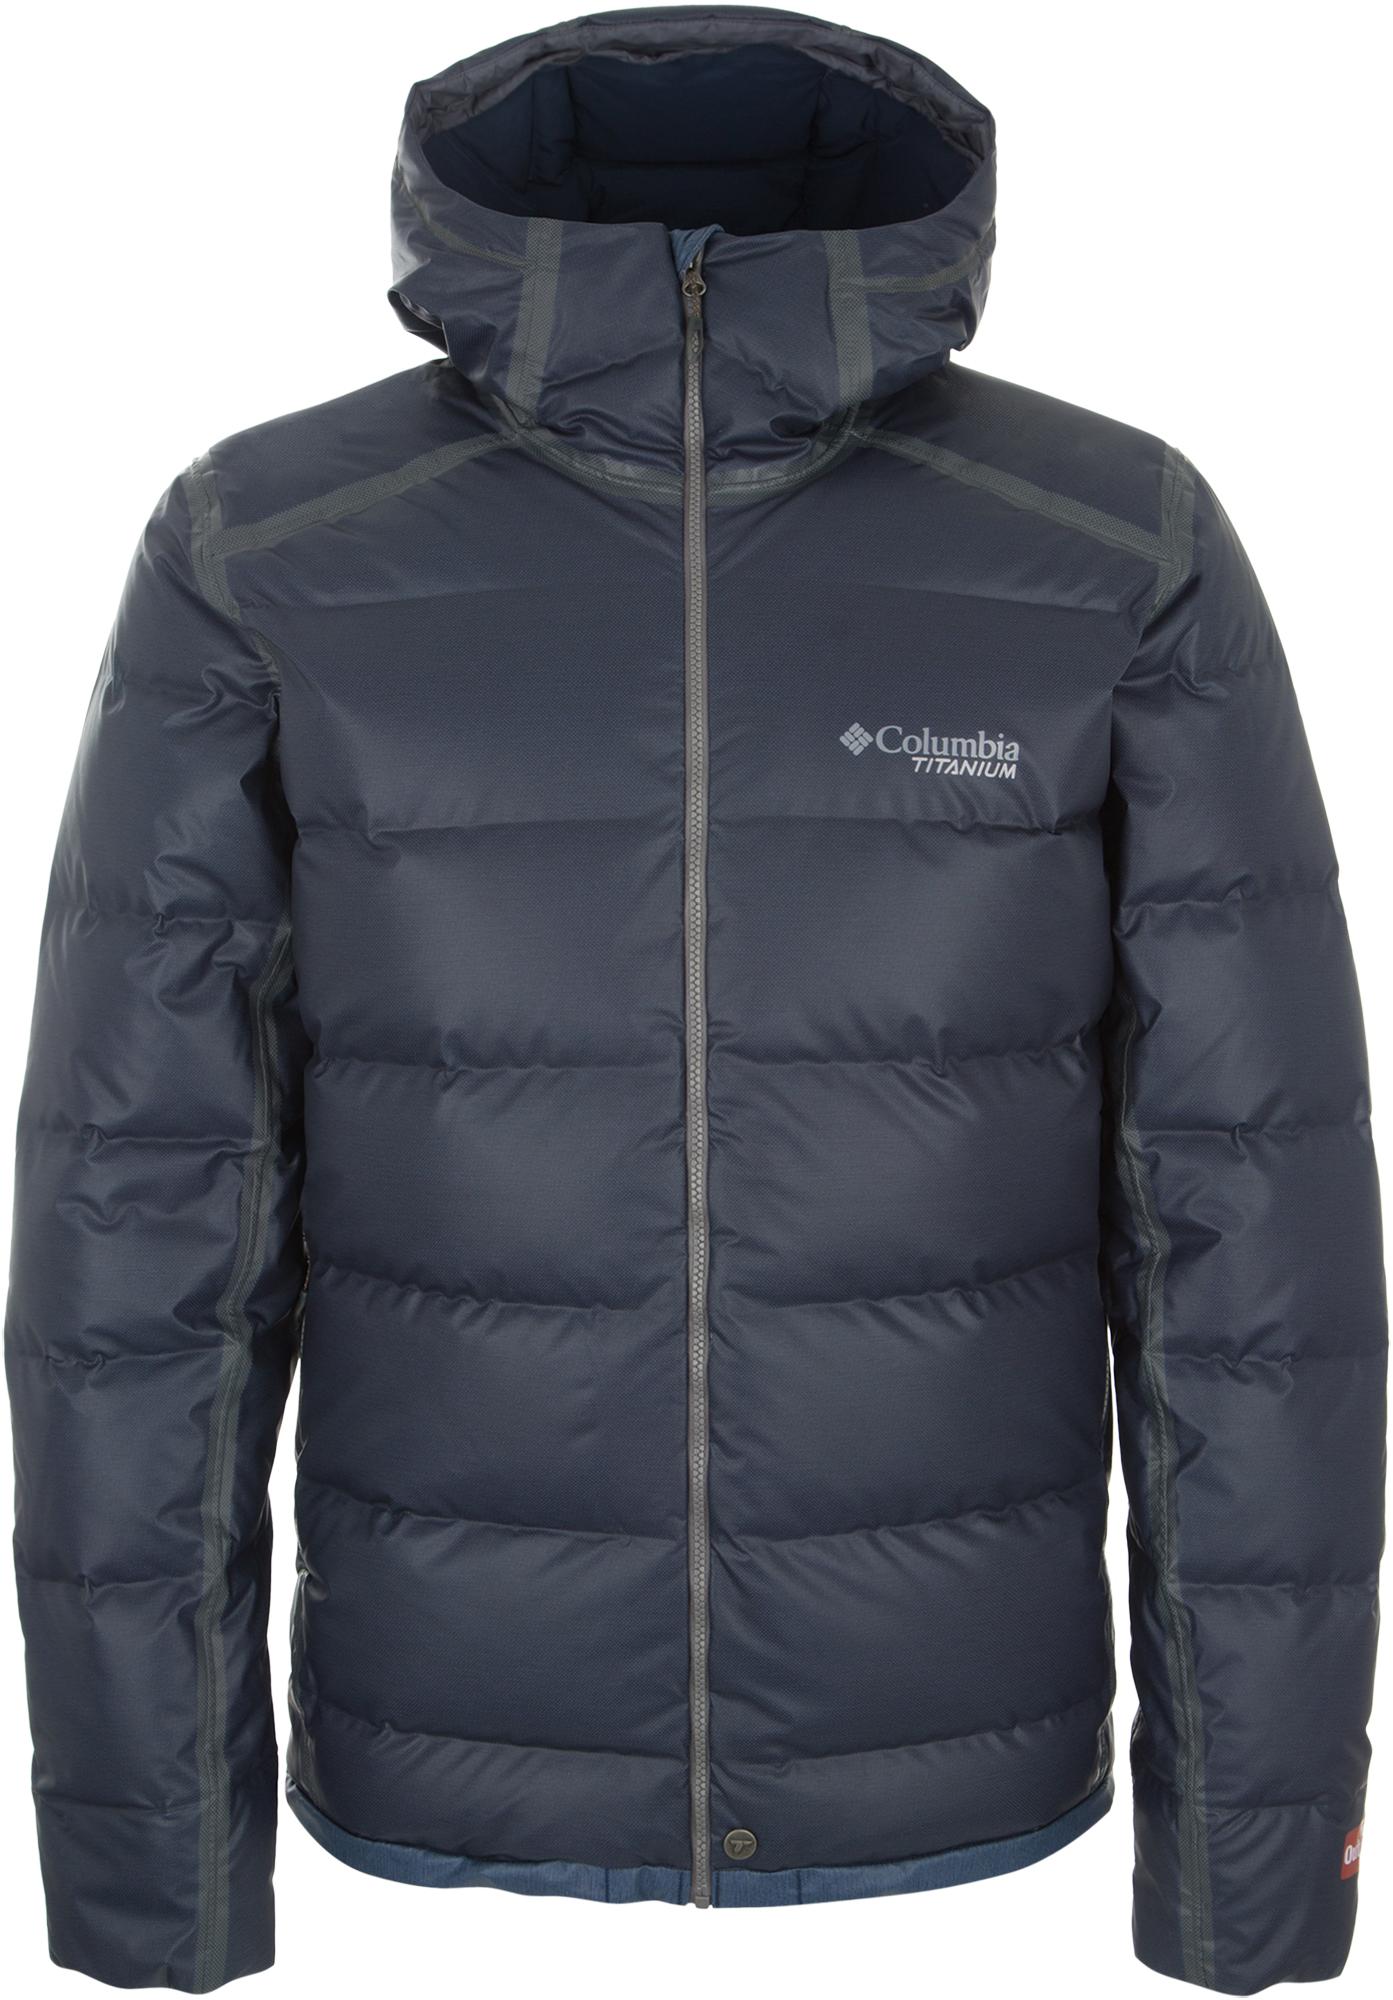 Columbia Куртка пуховая мужская Columbia OutDry Ex Alta Peak, размер 52-54